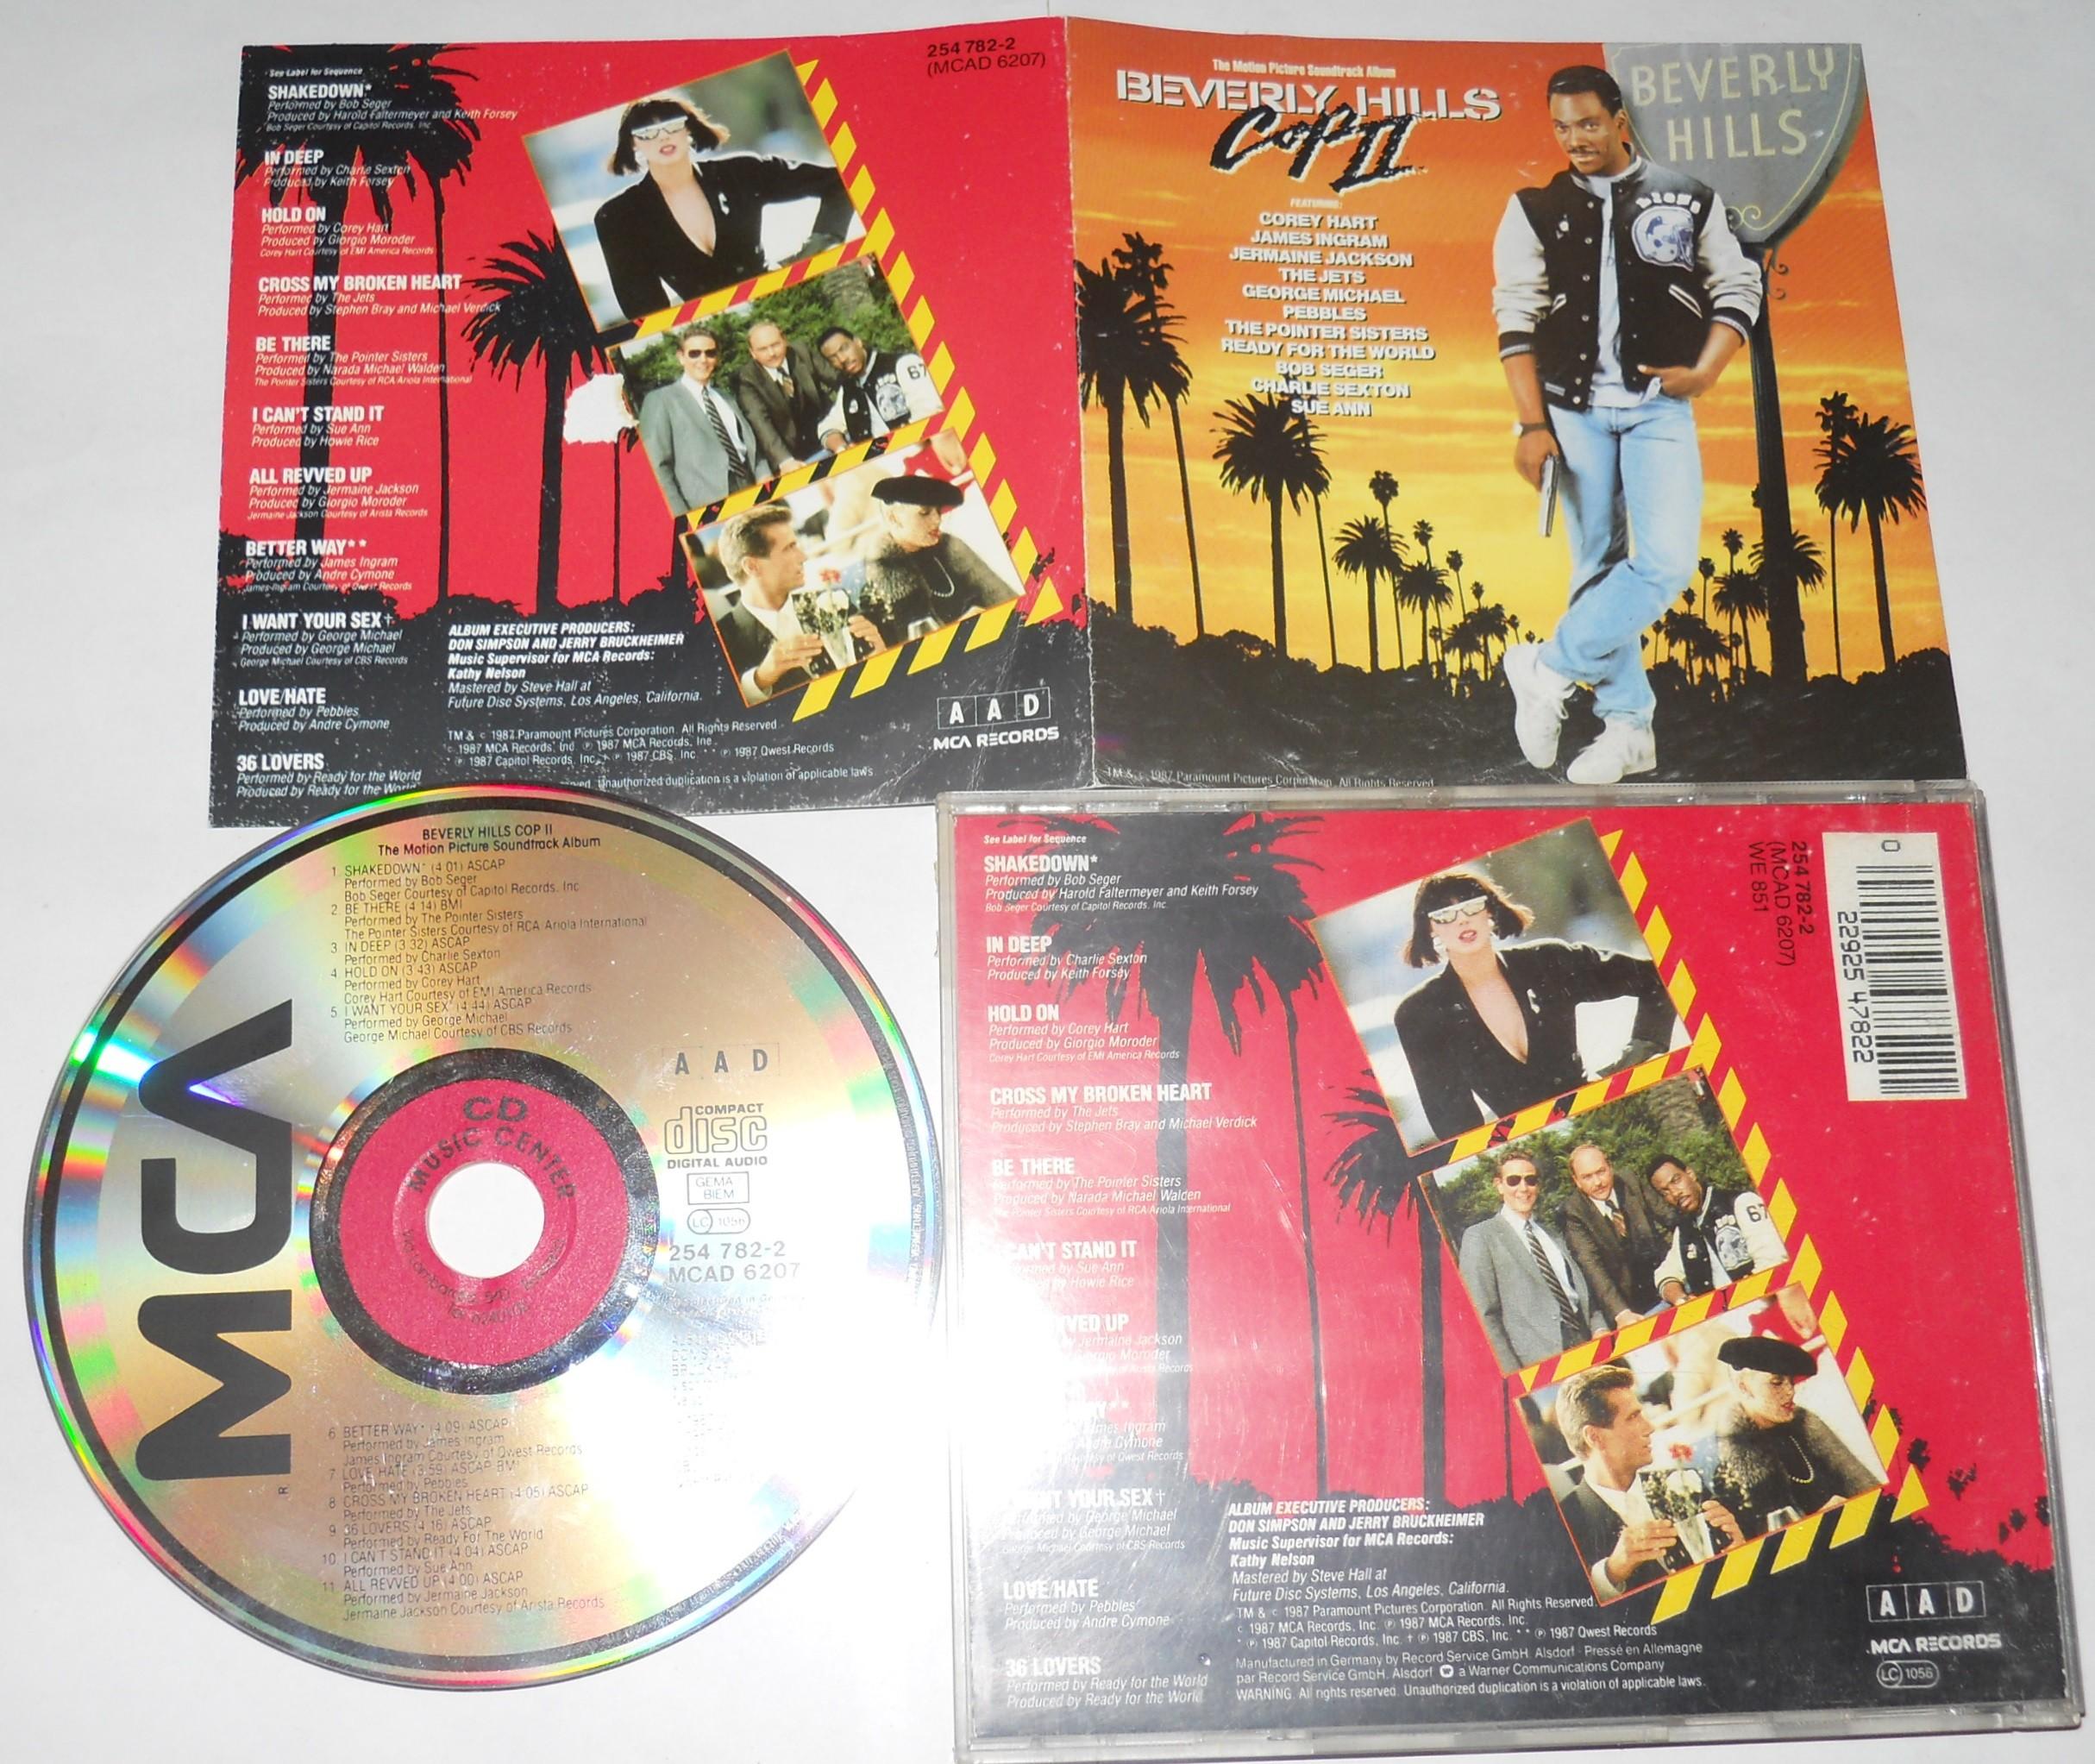 BEVERLY HILLS COP II - Soundtrack - CD